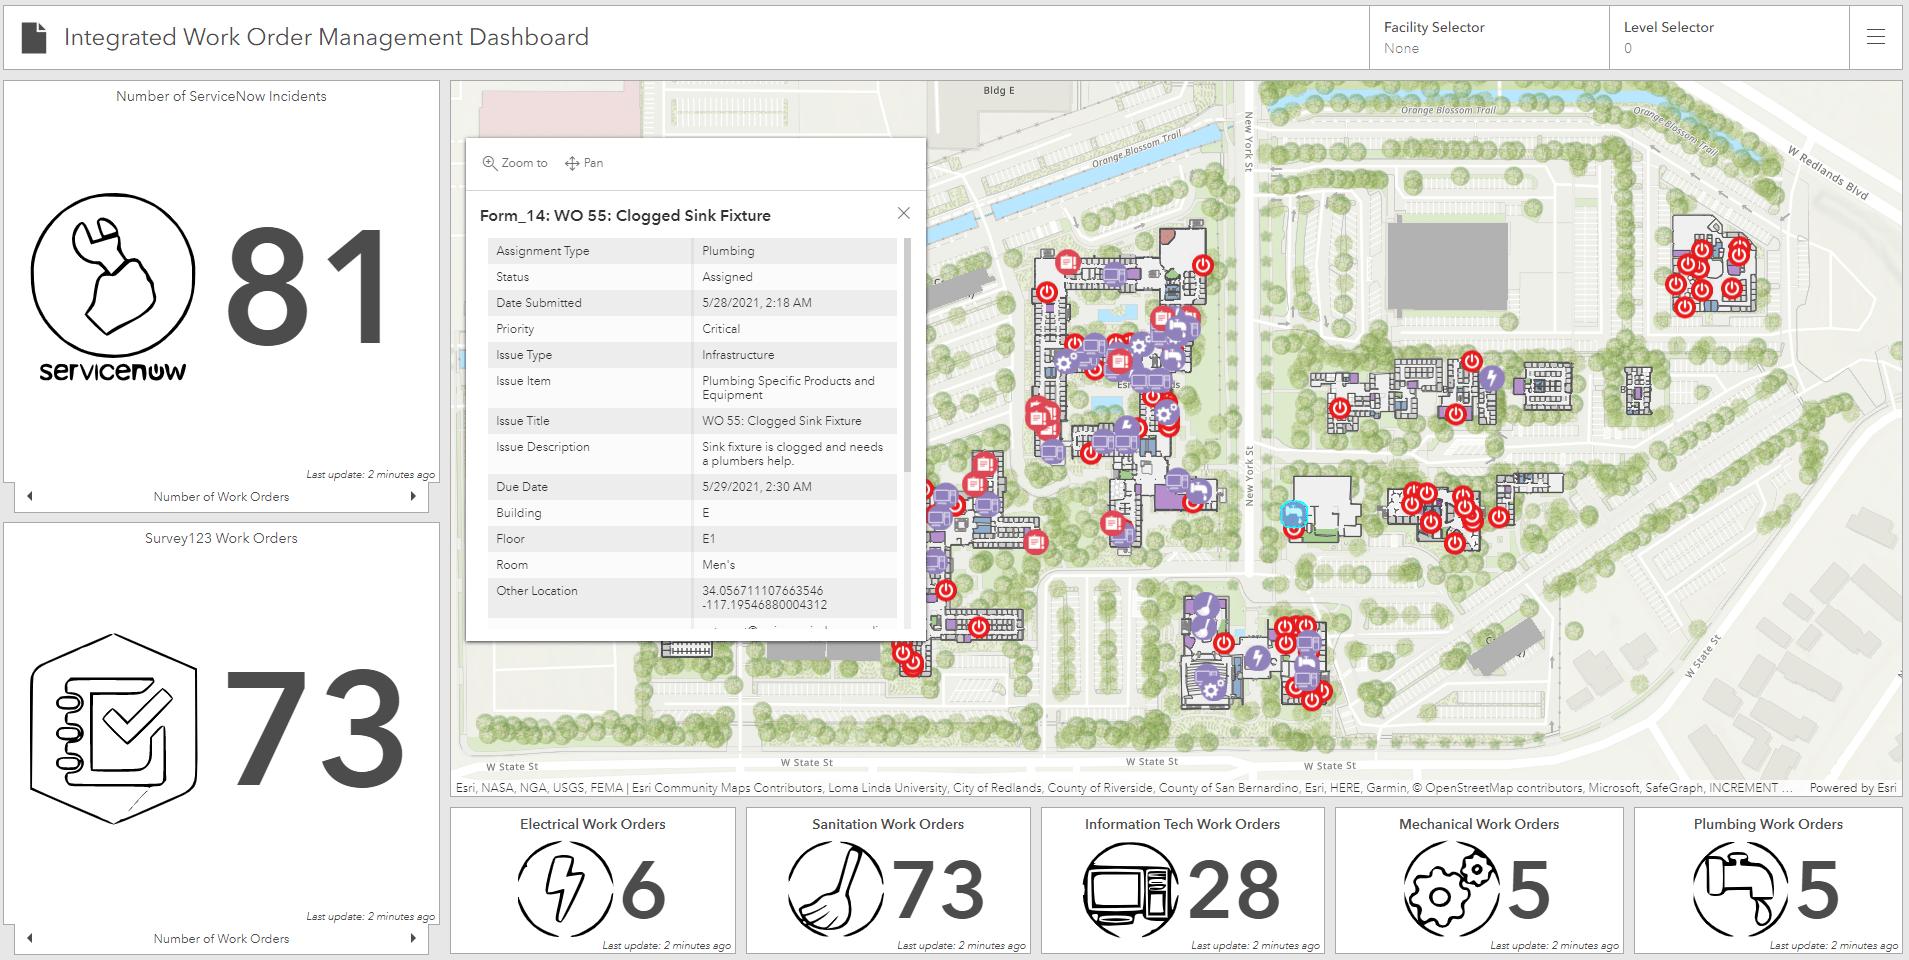 arcgis indoors integrated work order management dashboard